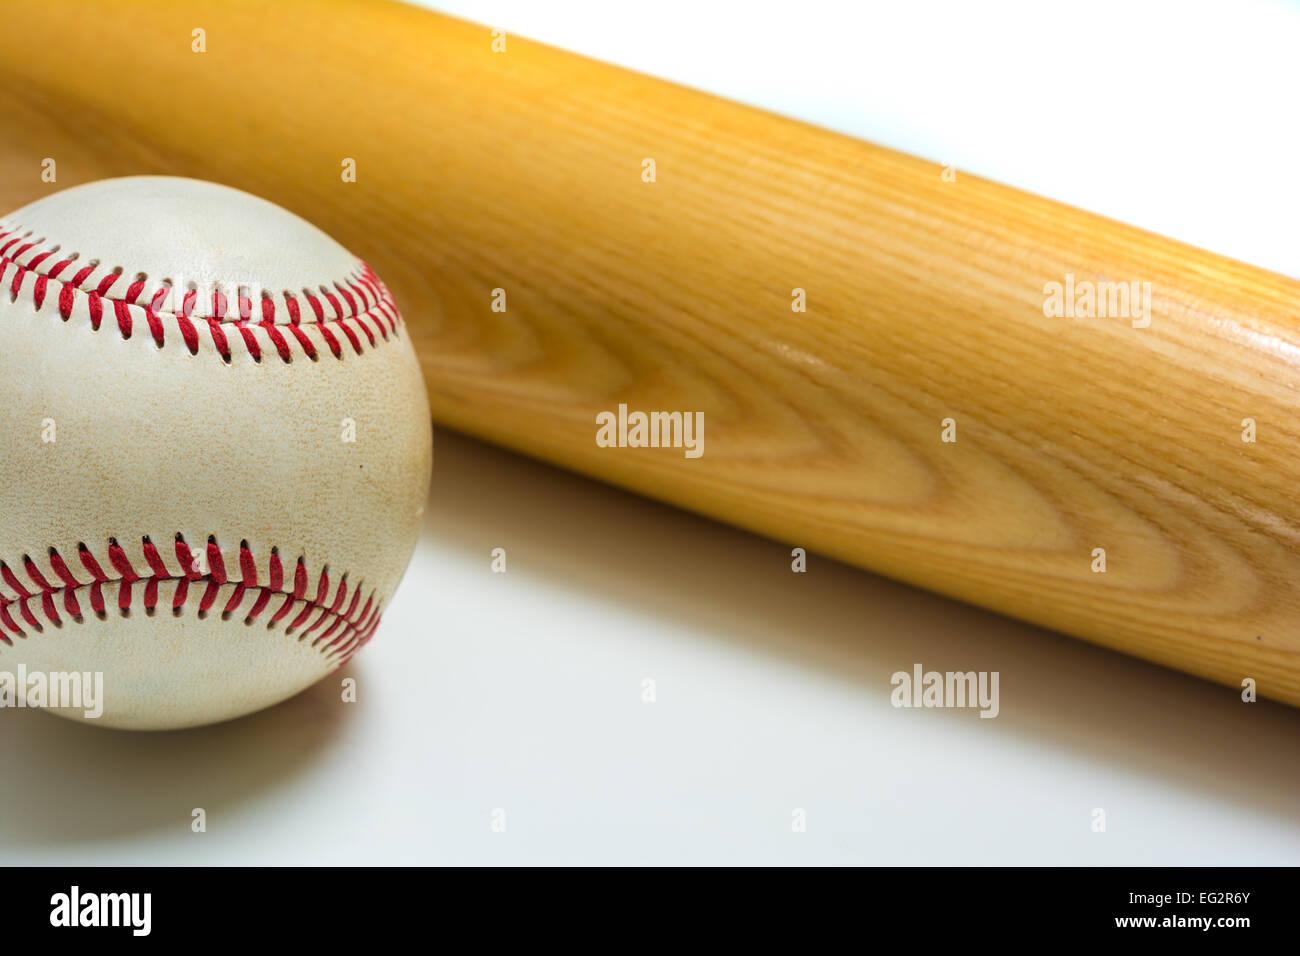 Wooden baseball bat on leather ball on white background - Stock Image